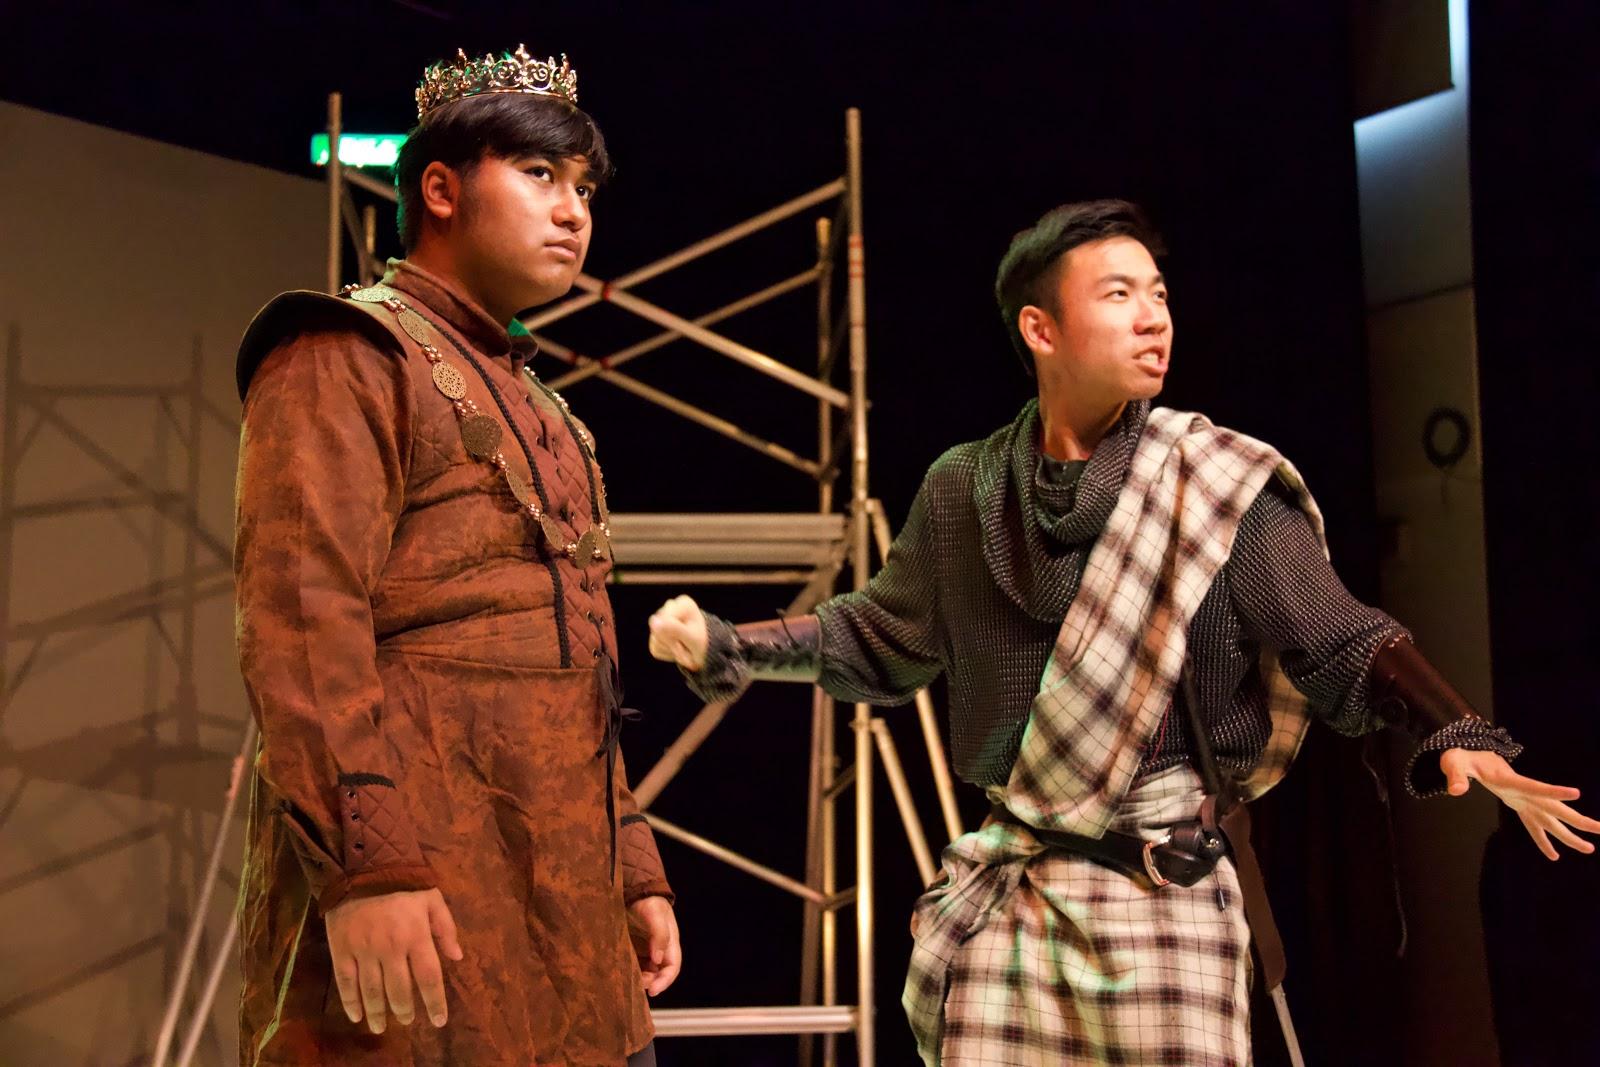 Drama image from Macbeth